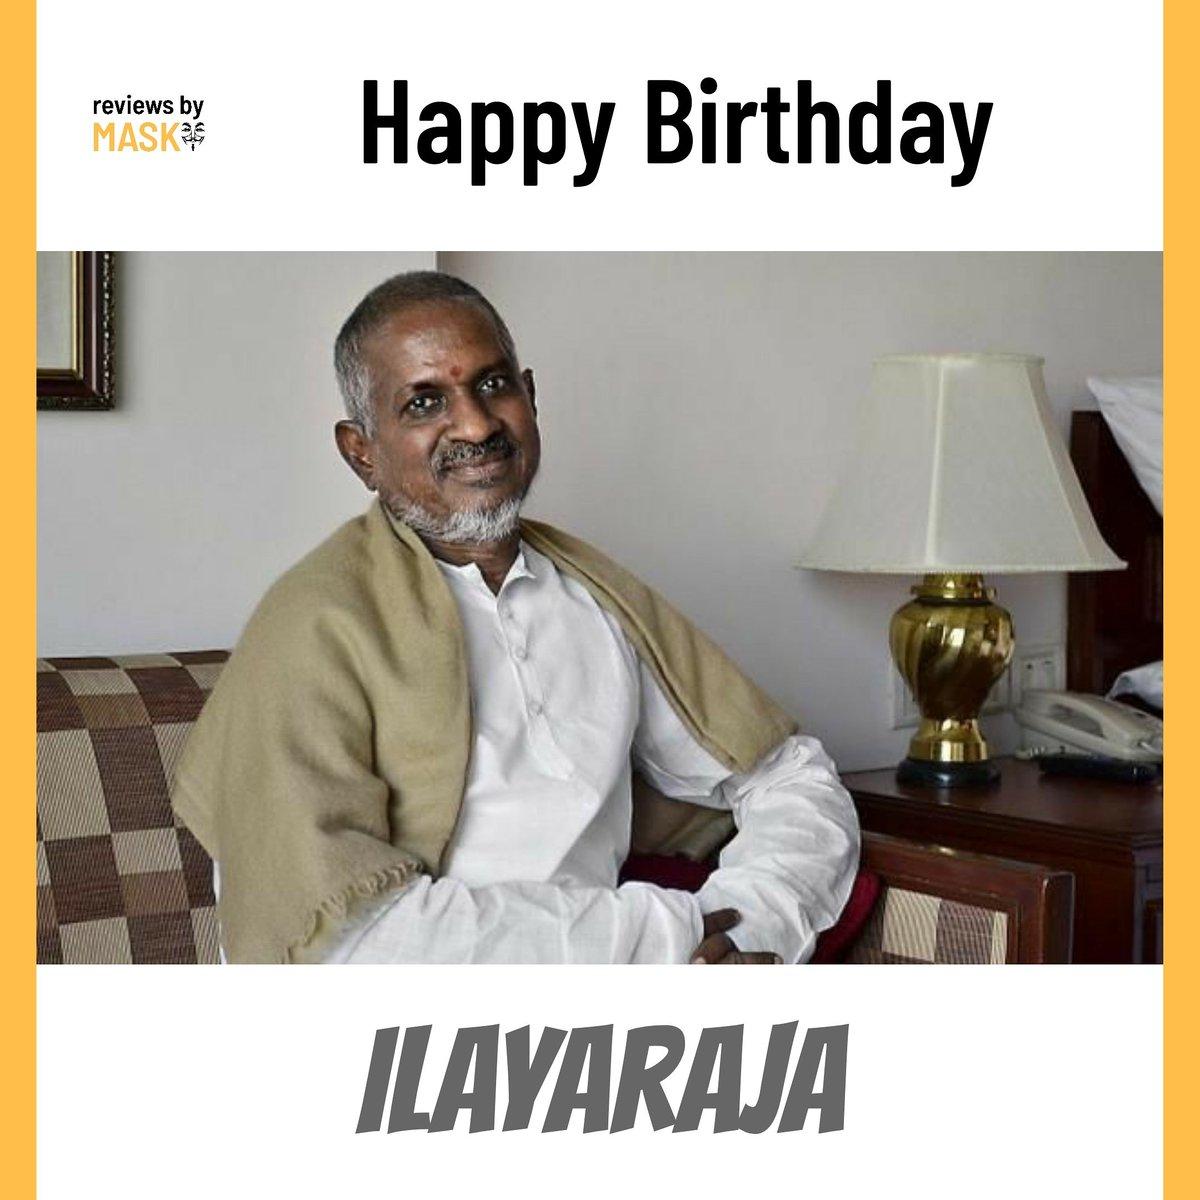 Happy B'day Ilayaraja#hbdilayaraja #happybirthdayilayaraja #ilayaraja #mohanlal #mammootty #tamilmovie #tamil #kollywood #tamilcinema #tamilsong #thalapathy #tamilstatus #tamilactress #tamilbgm #tamilmusic #love #tamilsongs #tamilan #tamillove #kollywoodcinema #tamillovestapic.twitter.com/XQ26EDGjLy